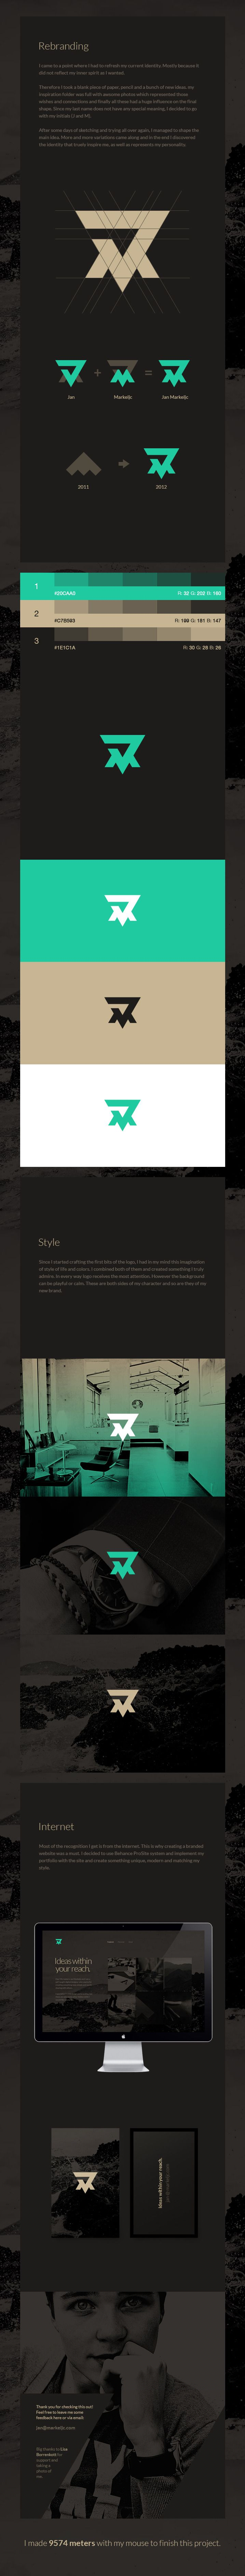 Markeljc | Designer: Jan Markeljc. Not my favorite monogram, but the process is interesting